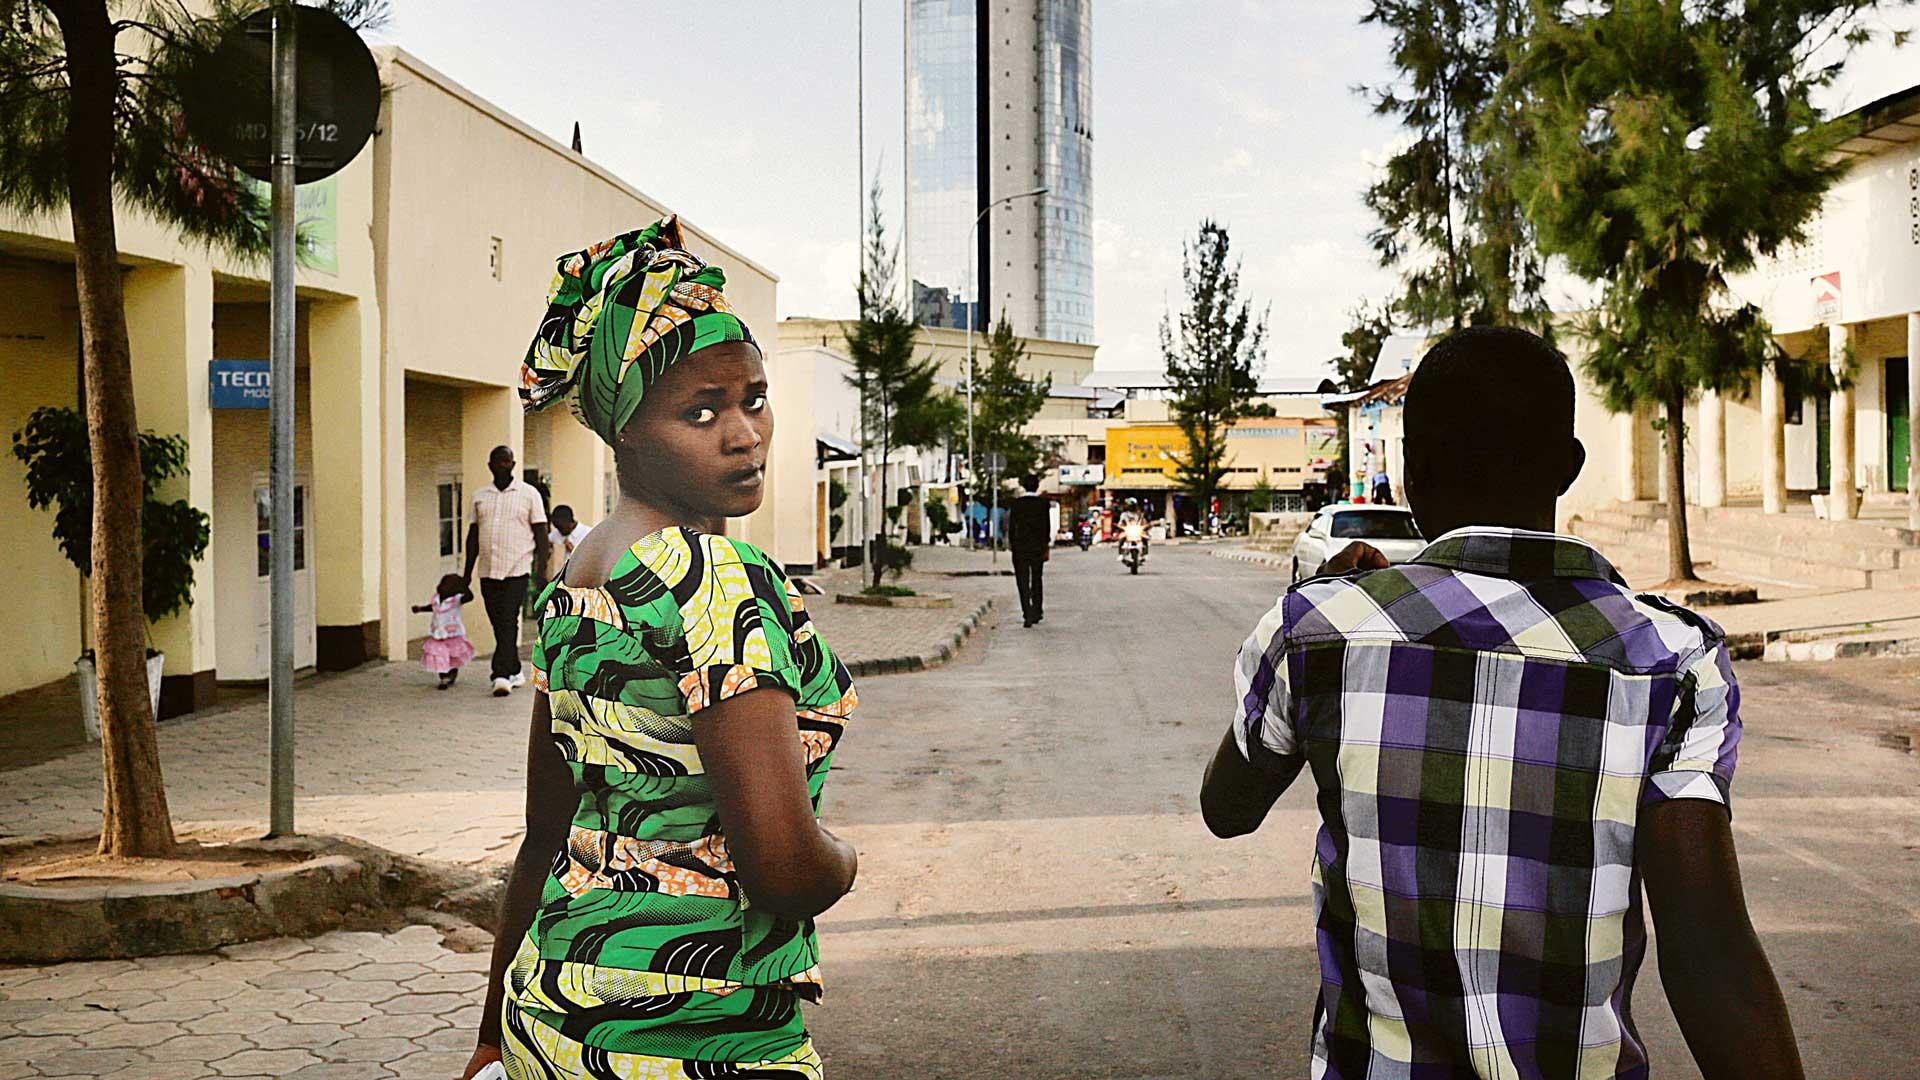 Afrikkalainen Teens suku puoli kuvia Pieni penis ja iso penis